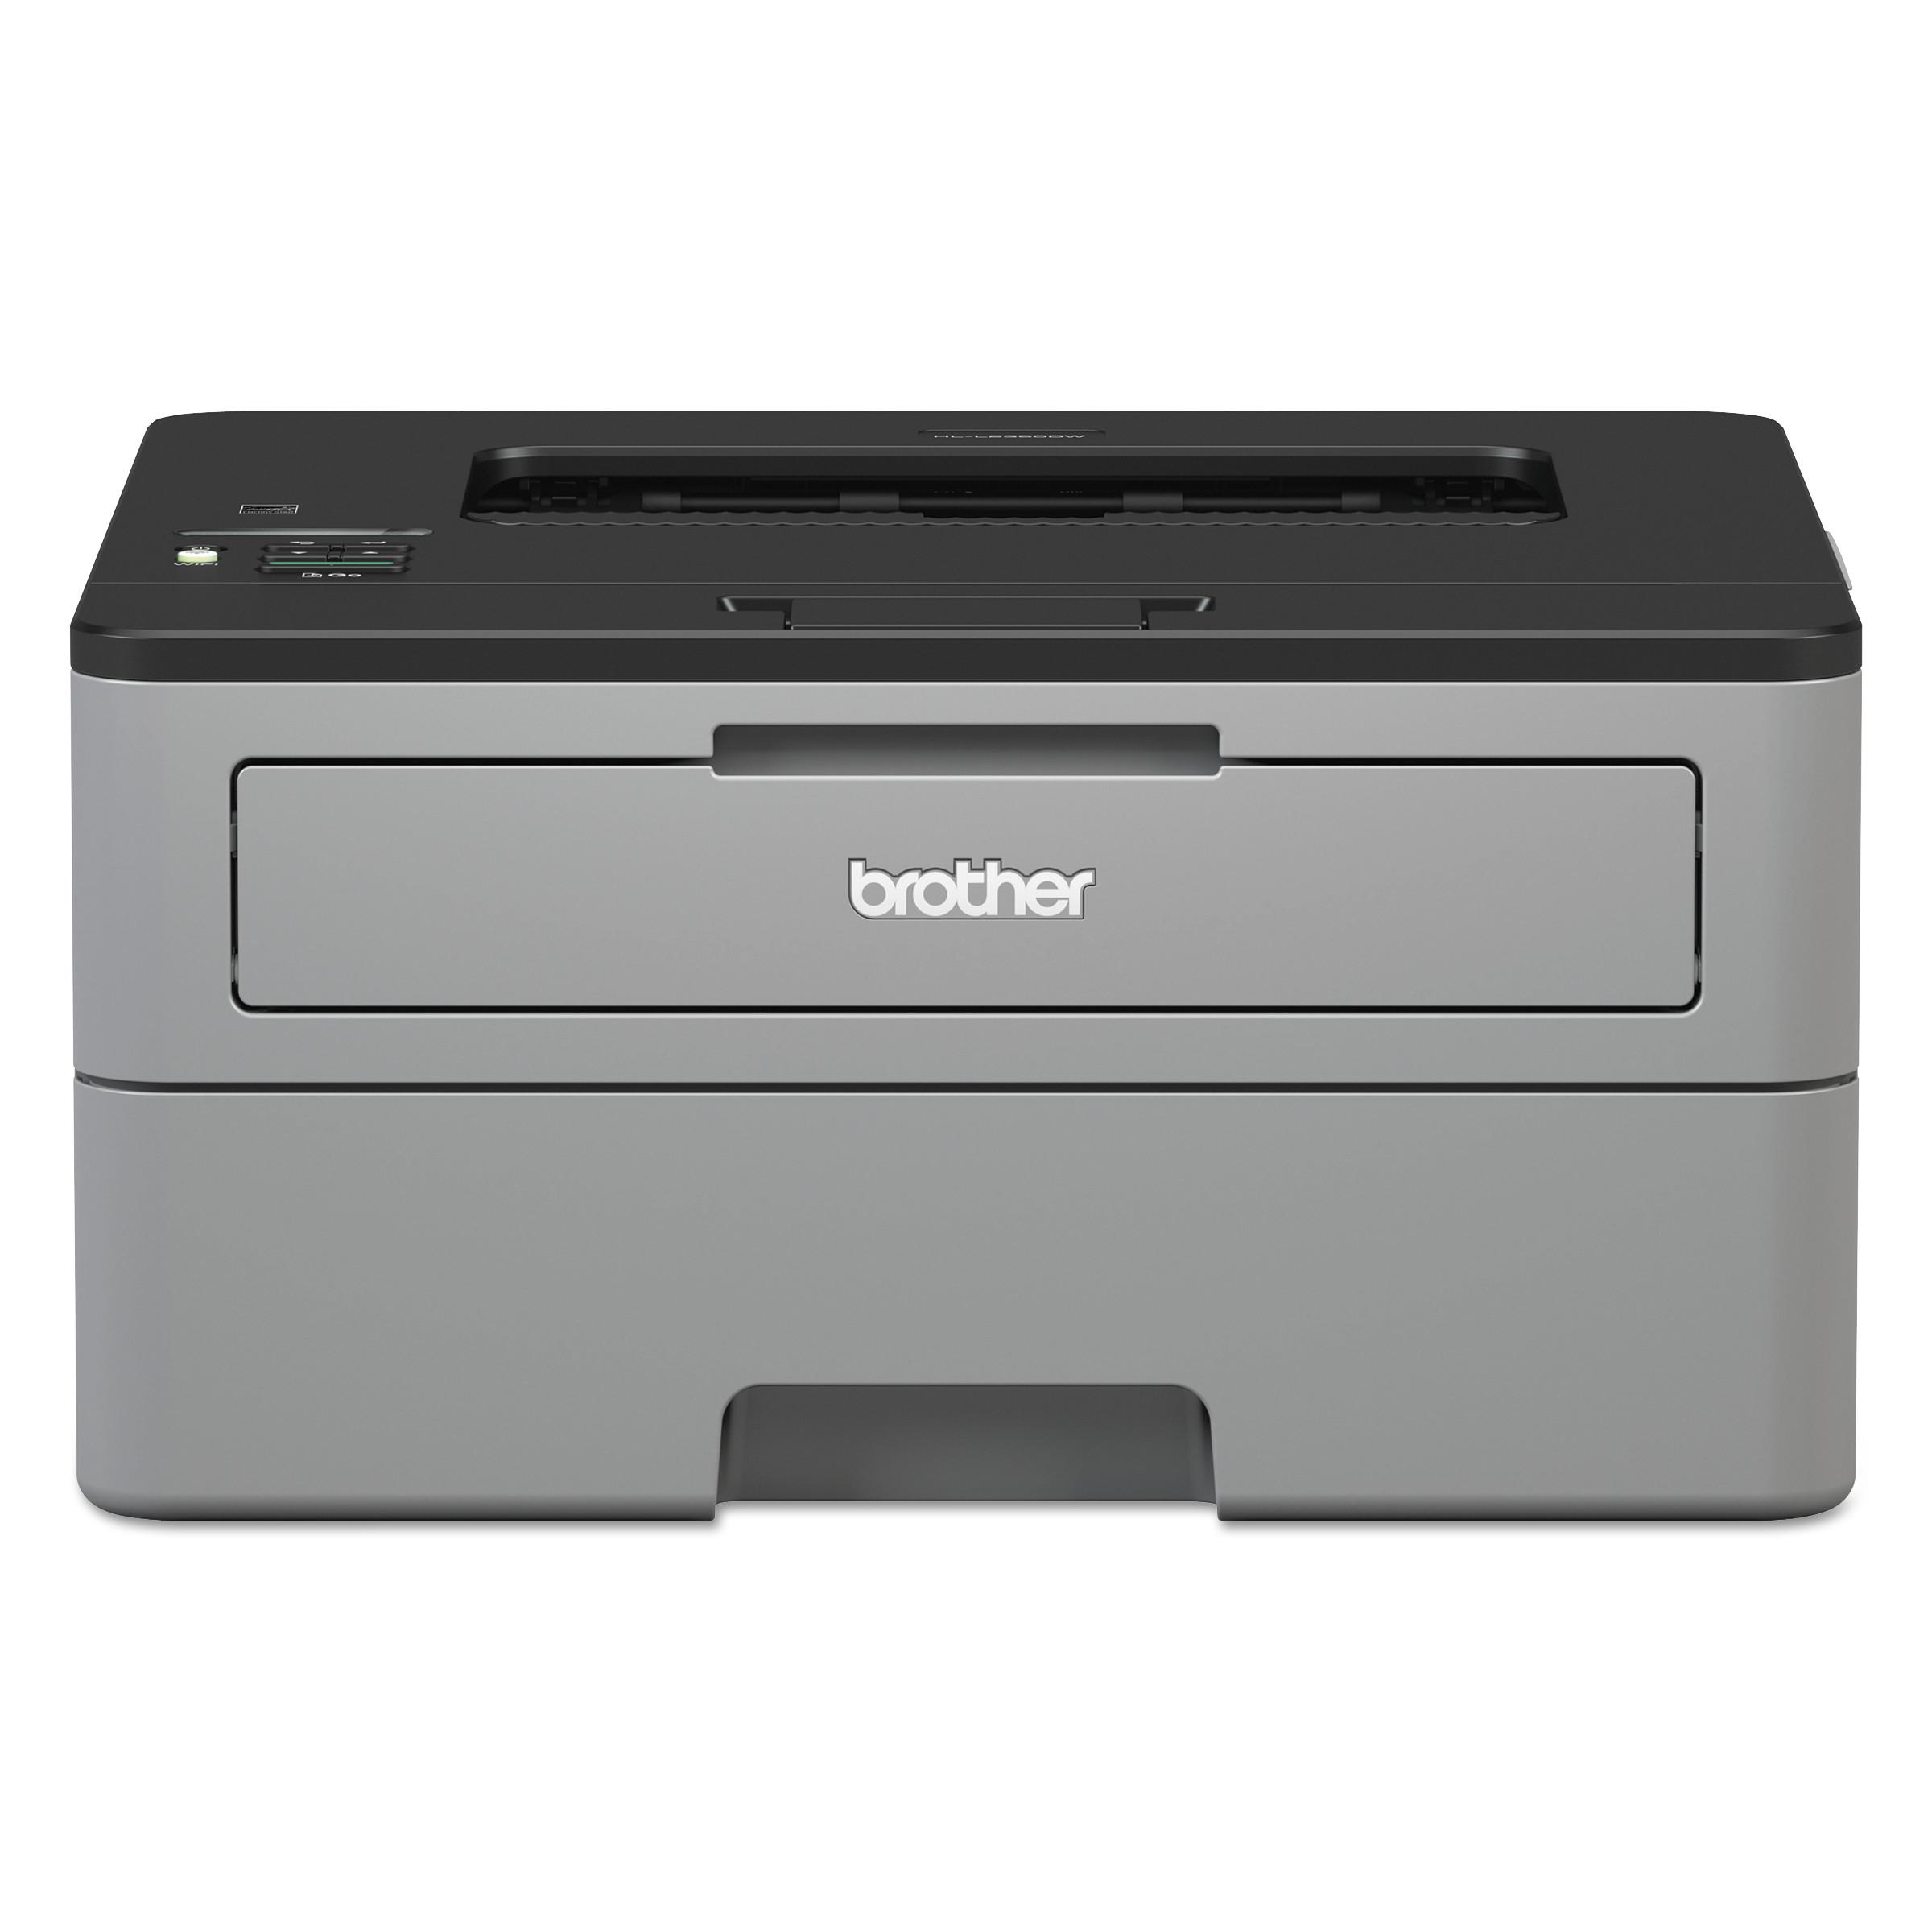 HL-L2350DW Wireless Laser Printer